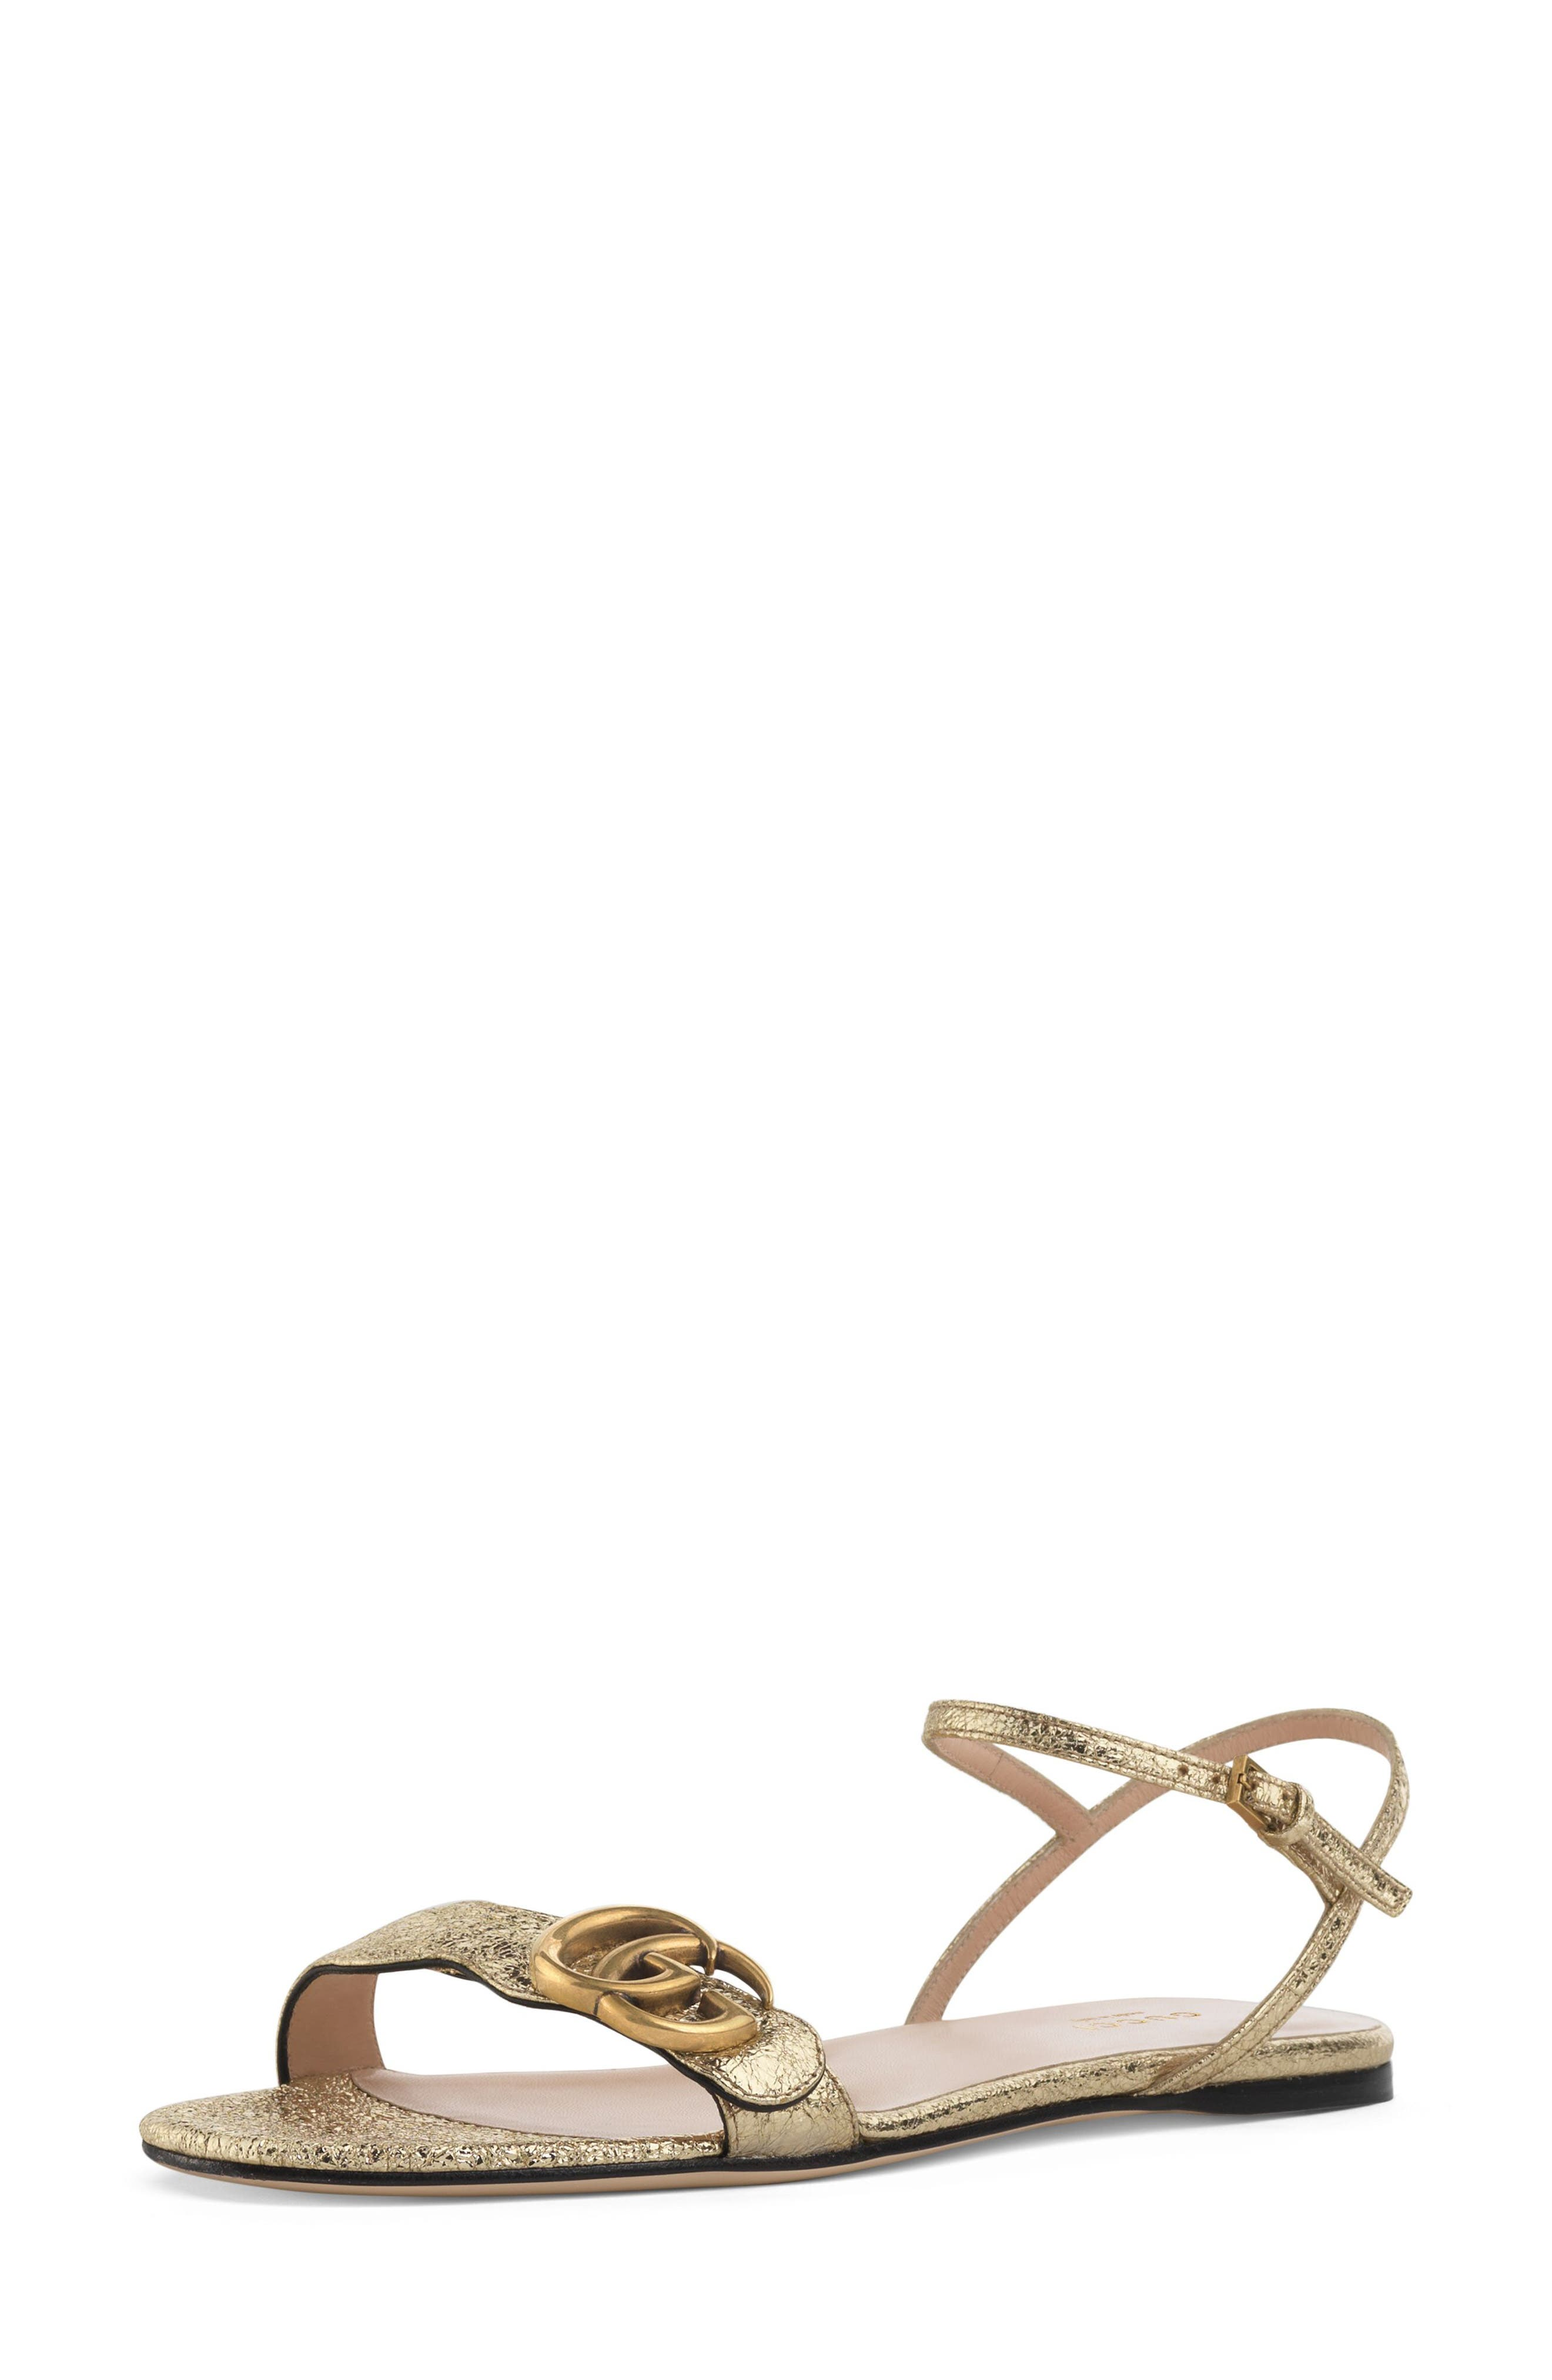 GUCCI Marmont Quarter Strap Flat Sandal, Main, color, PLATINO